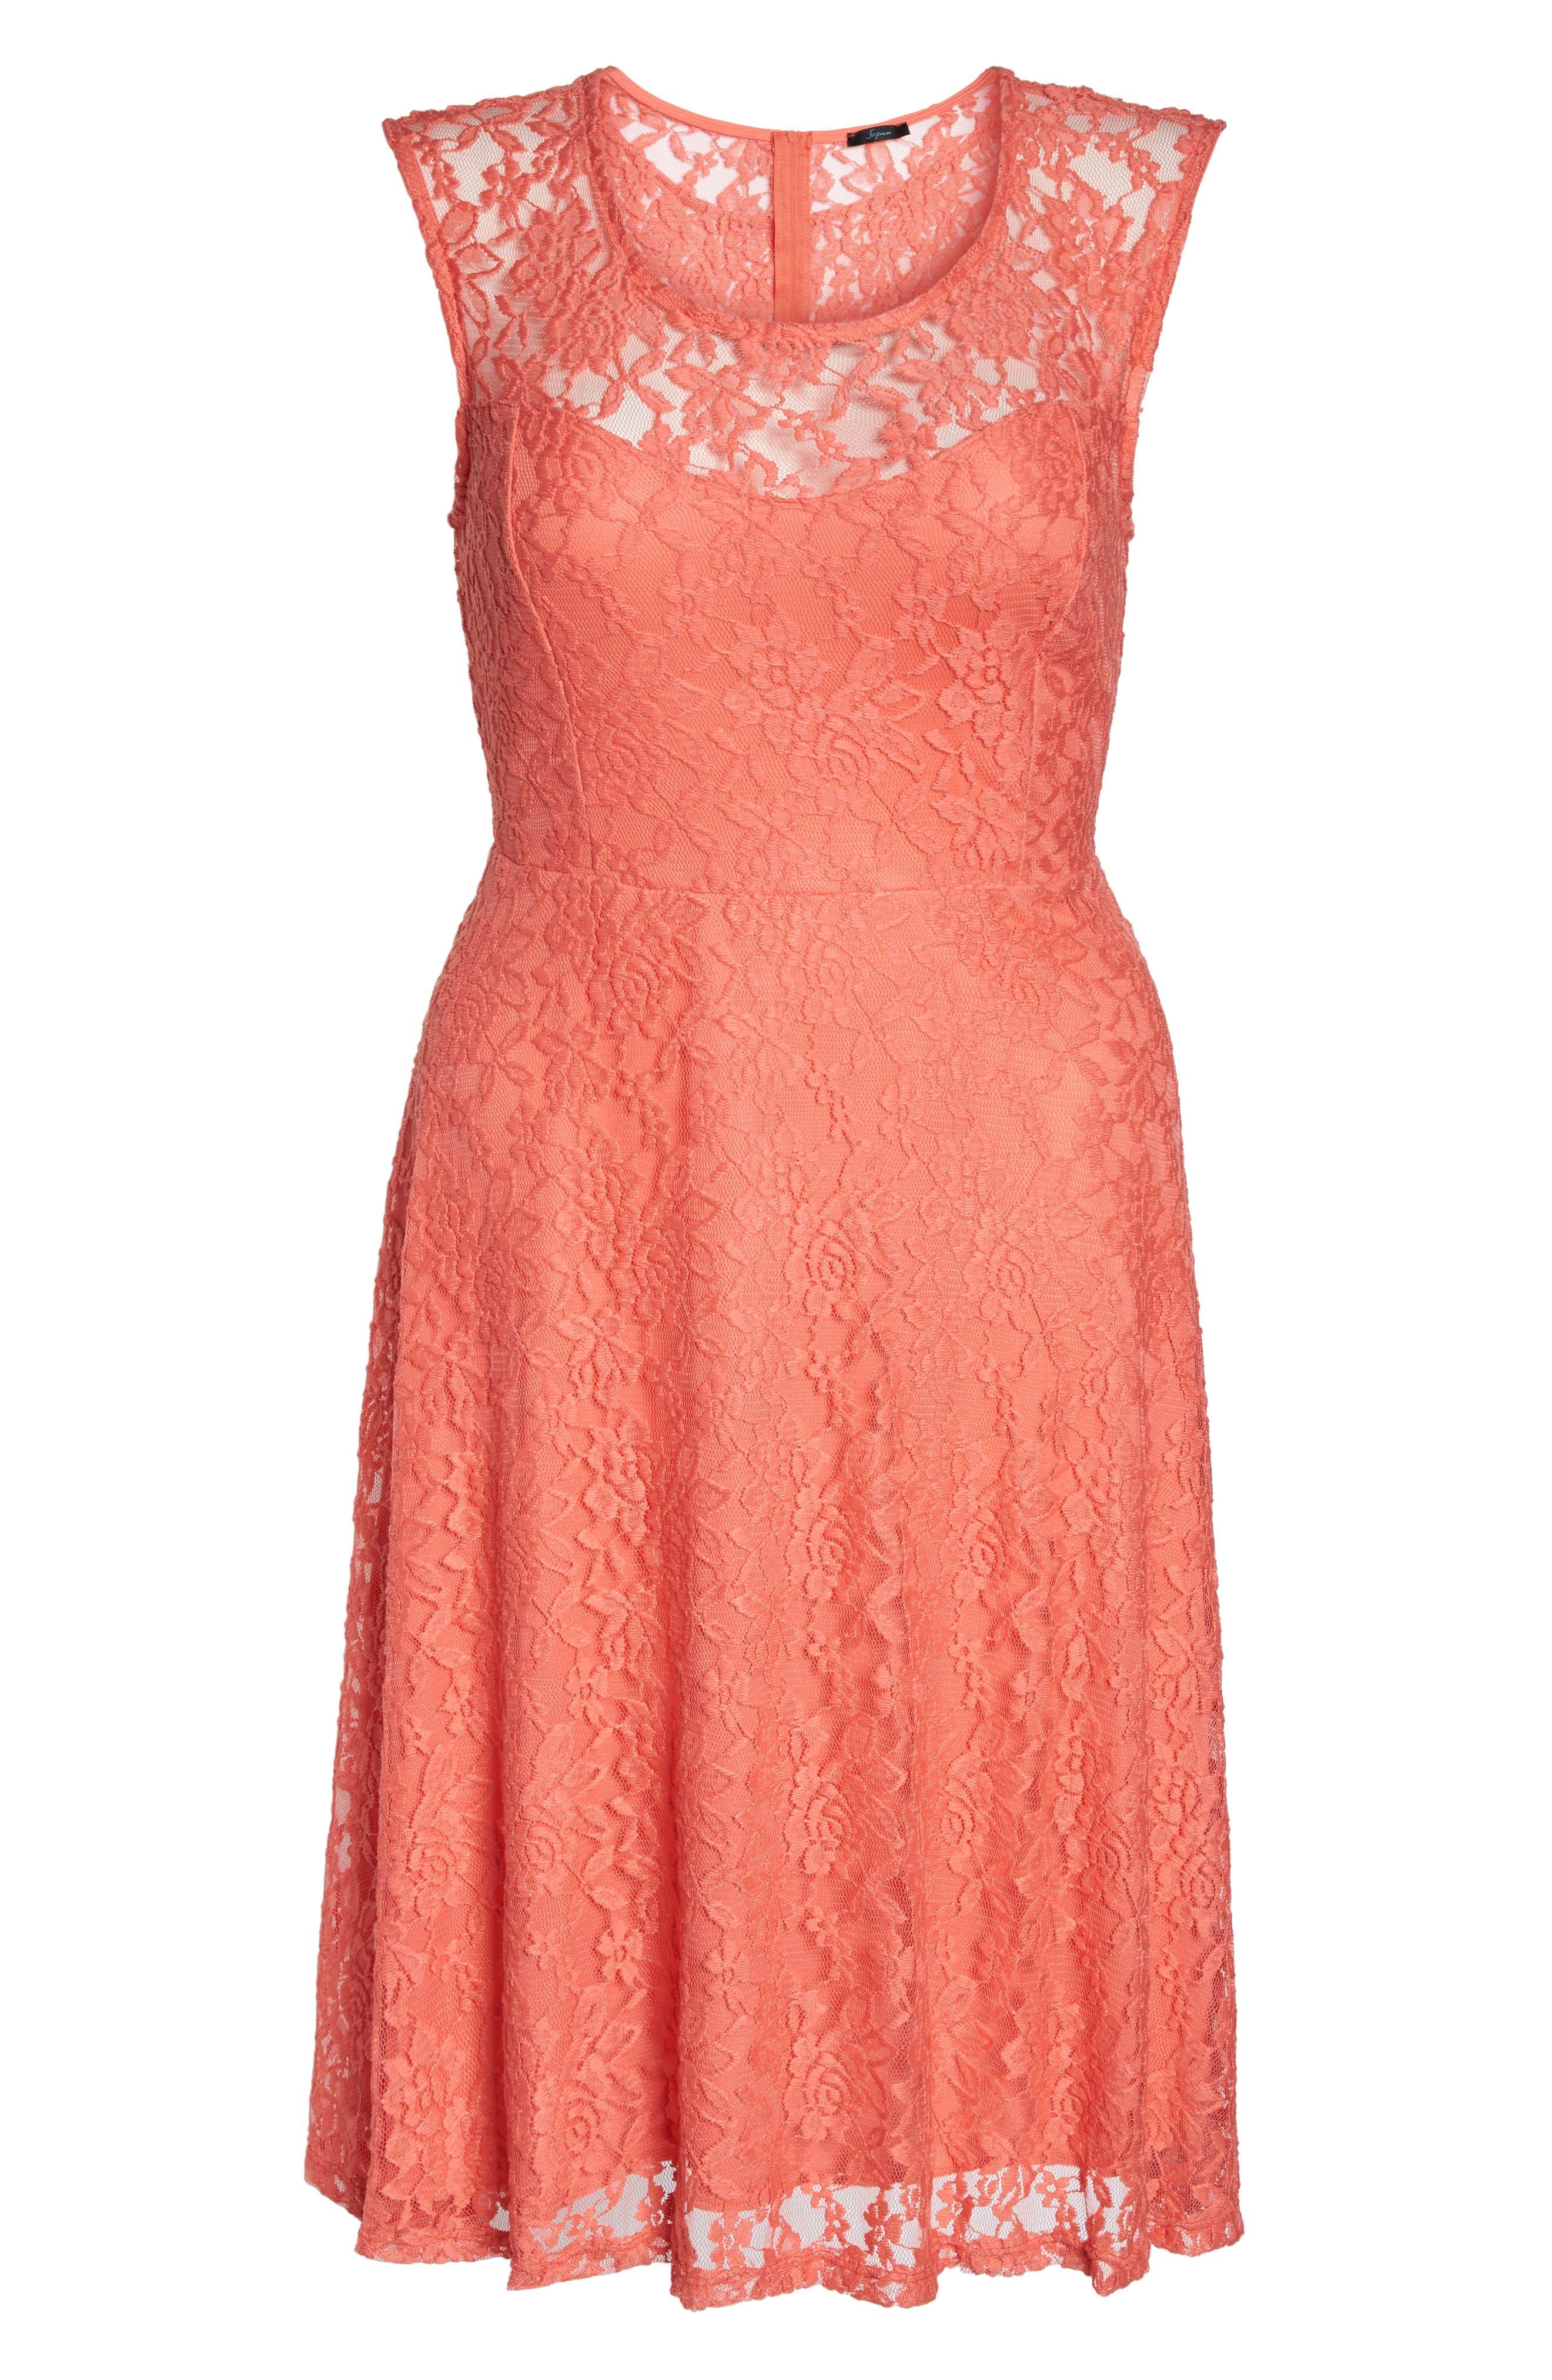 Lace Skater Dress,                             Alternate thumbnail 6, color,                             Coral